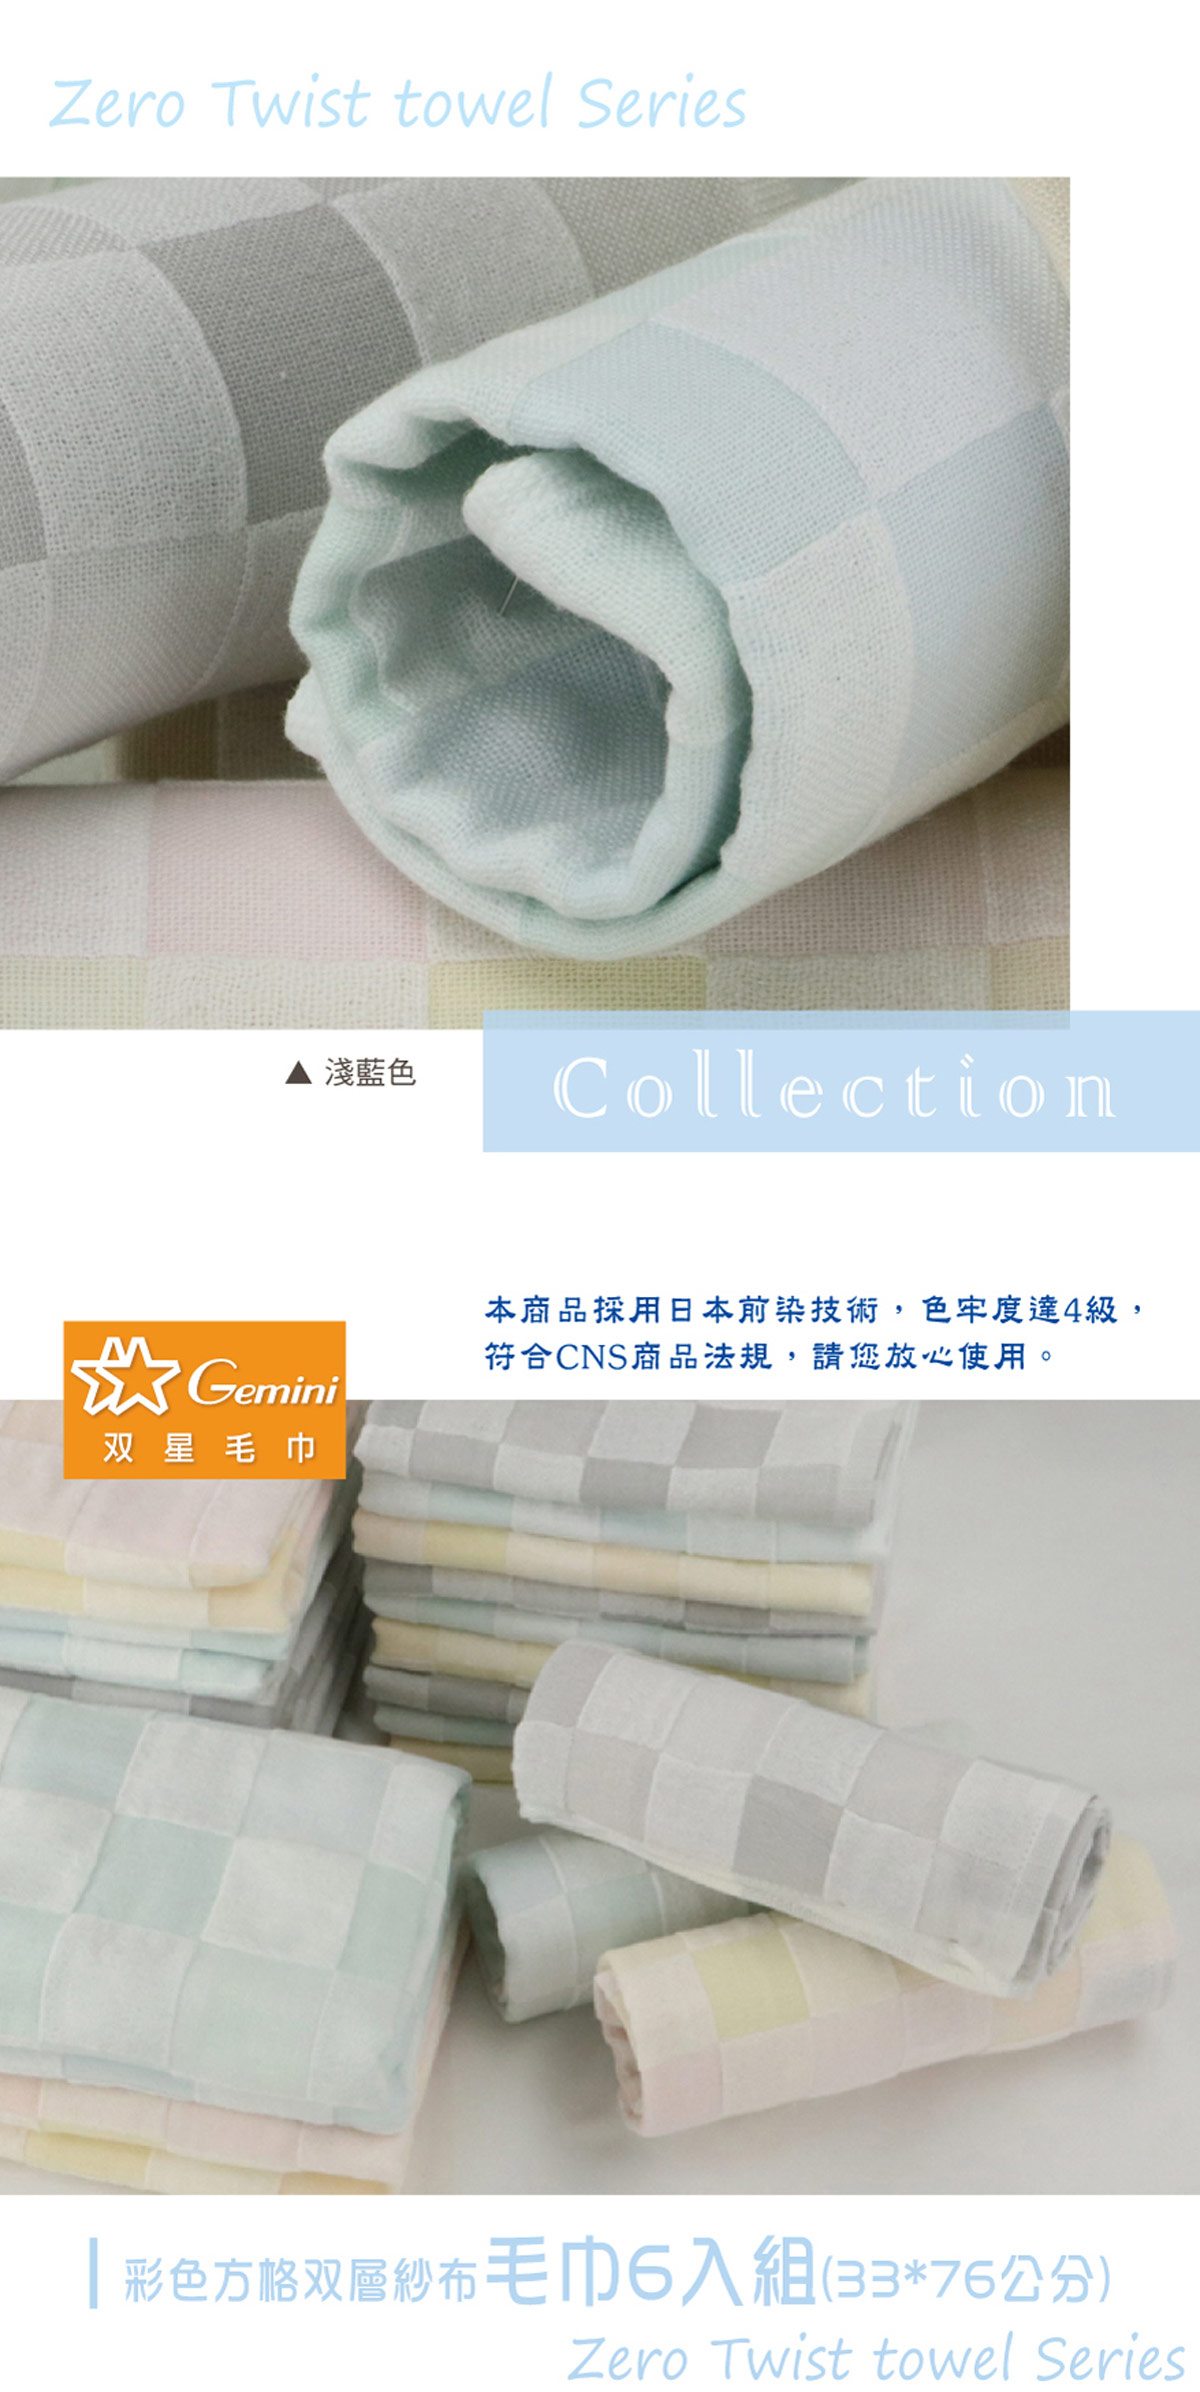 Gemini雙星毛巾彩色方格雙層紗布毛巾淺藍色,採日本前染技術,符合CNS商品法規。